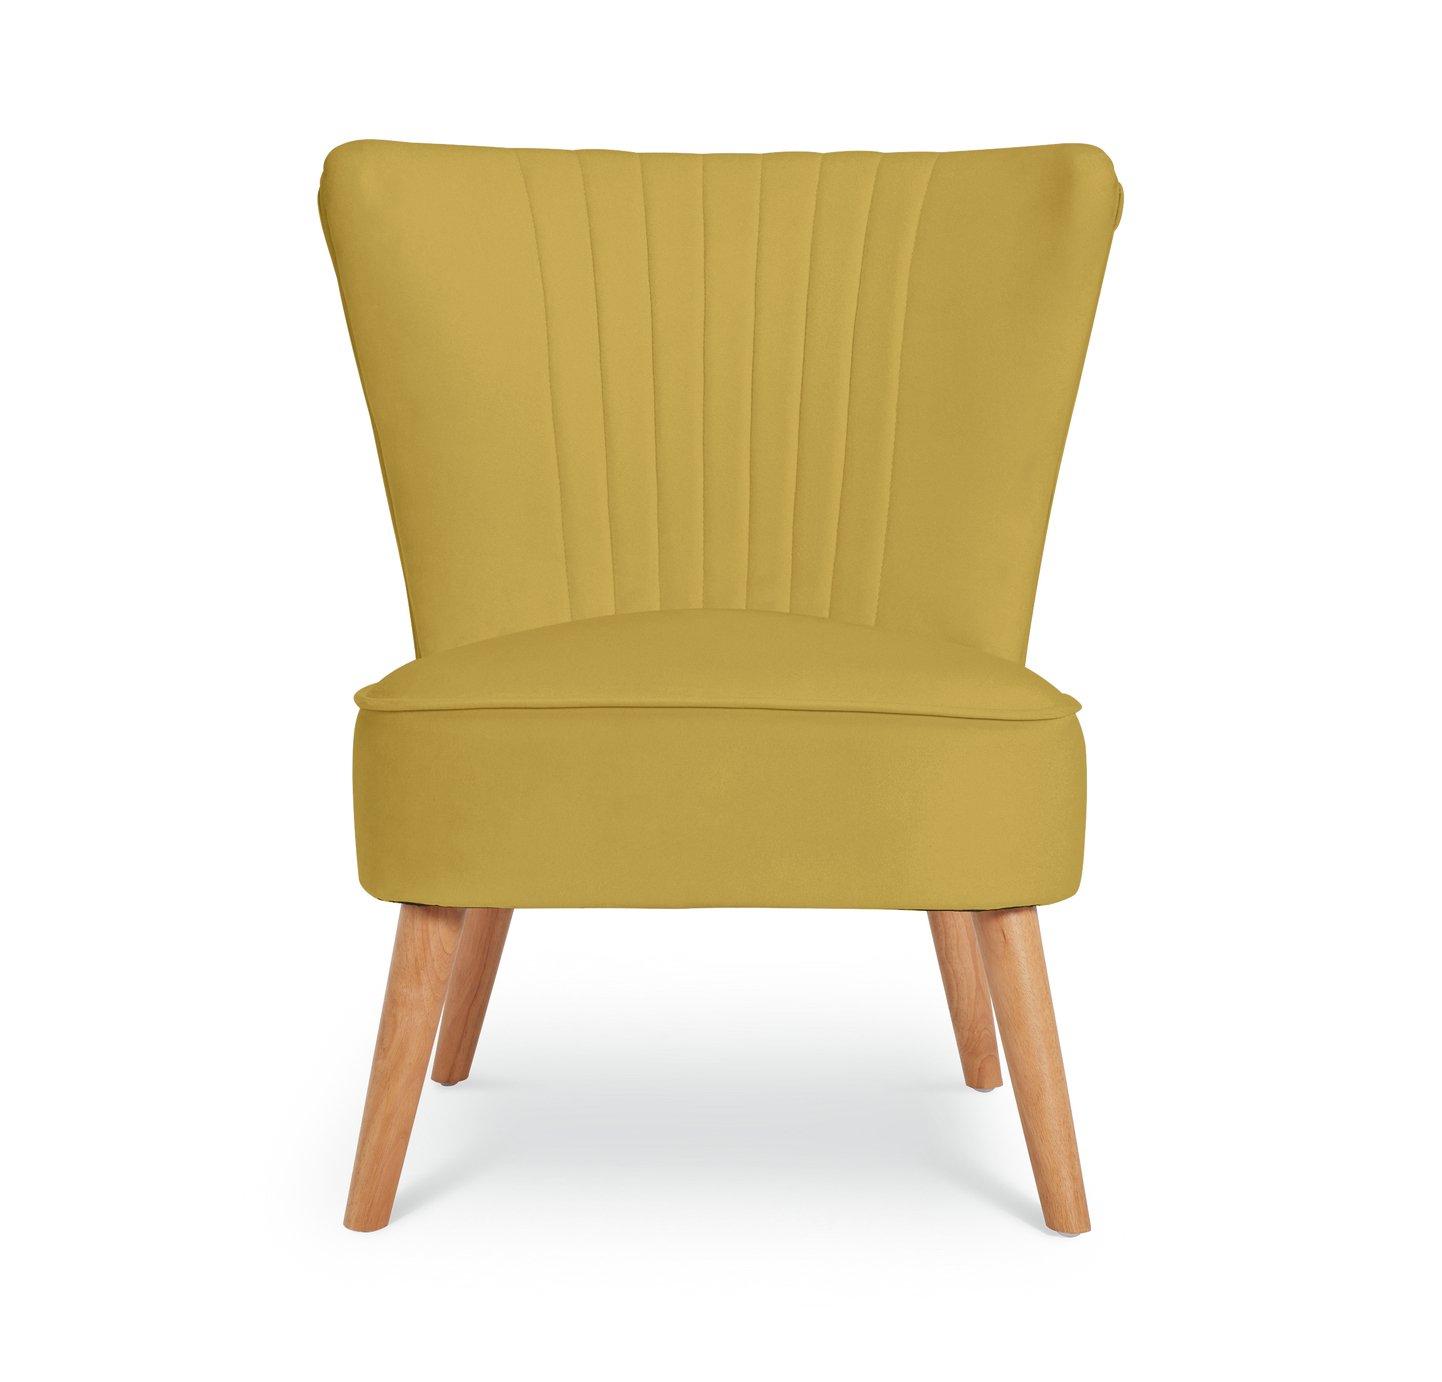 Argos Home Alana Velvet Shell Back Accent Chair - Yellow